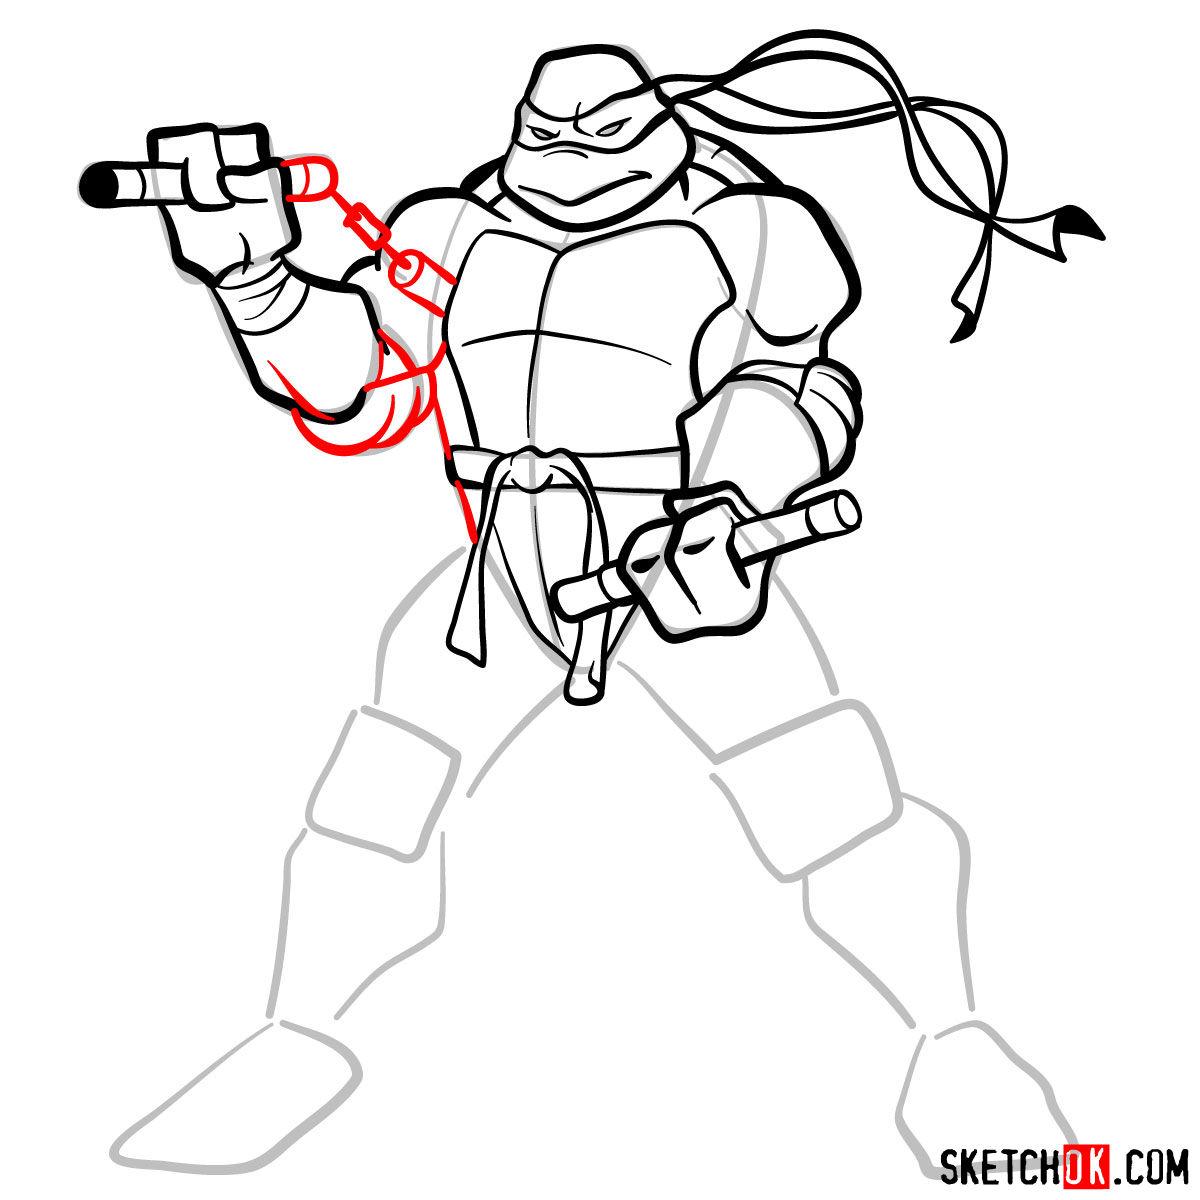 How to draw Michaelangelo ninja turtle - step 10